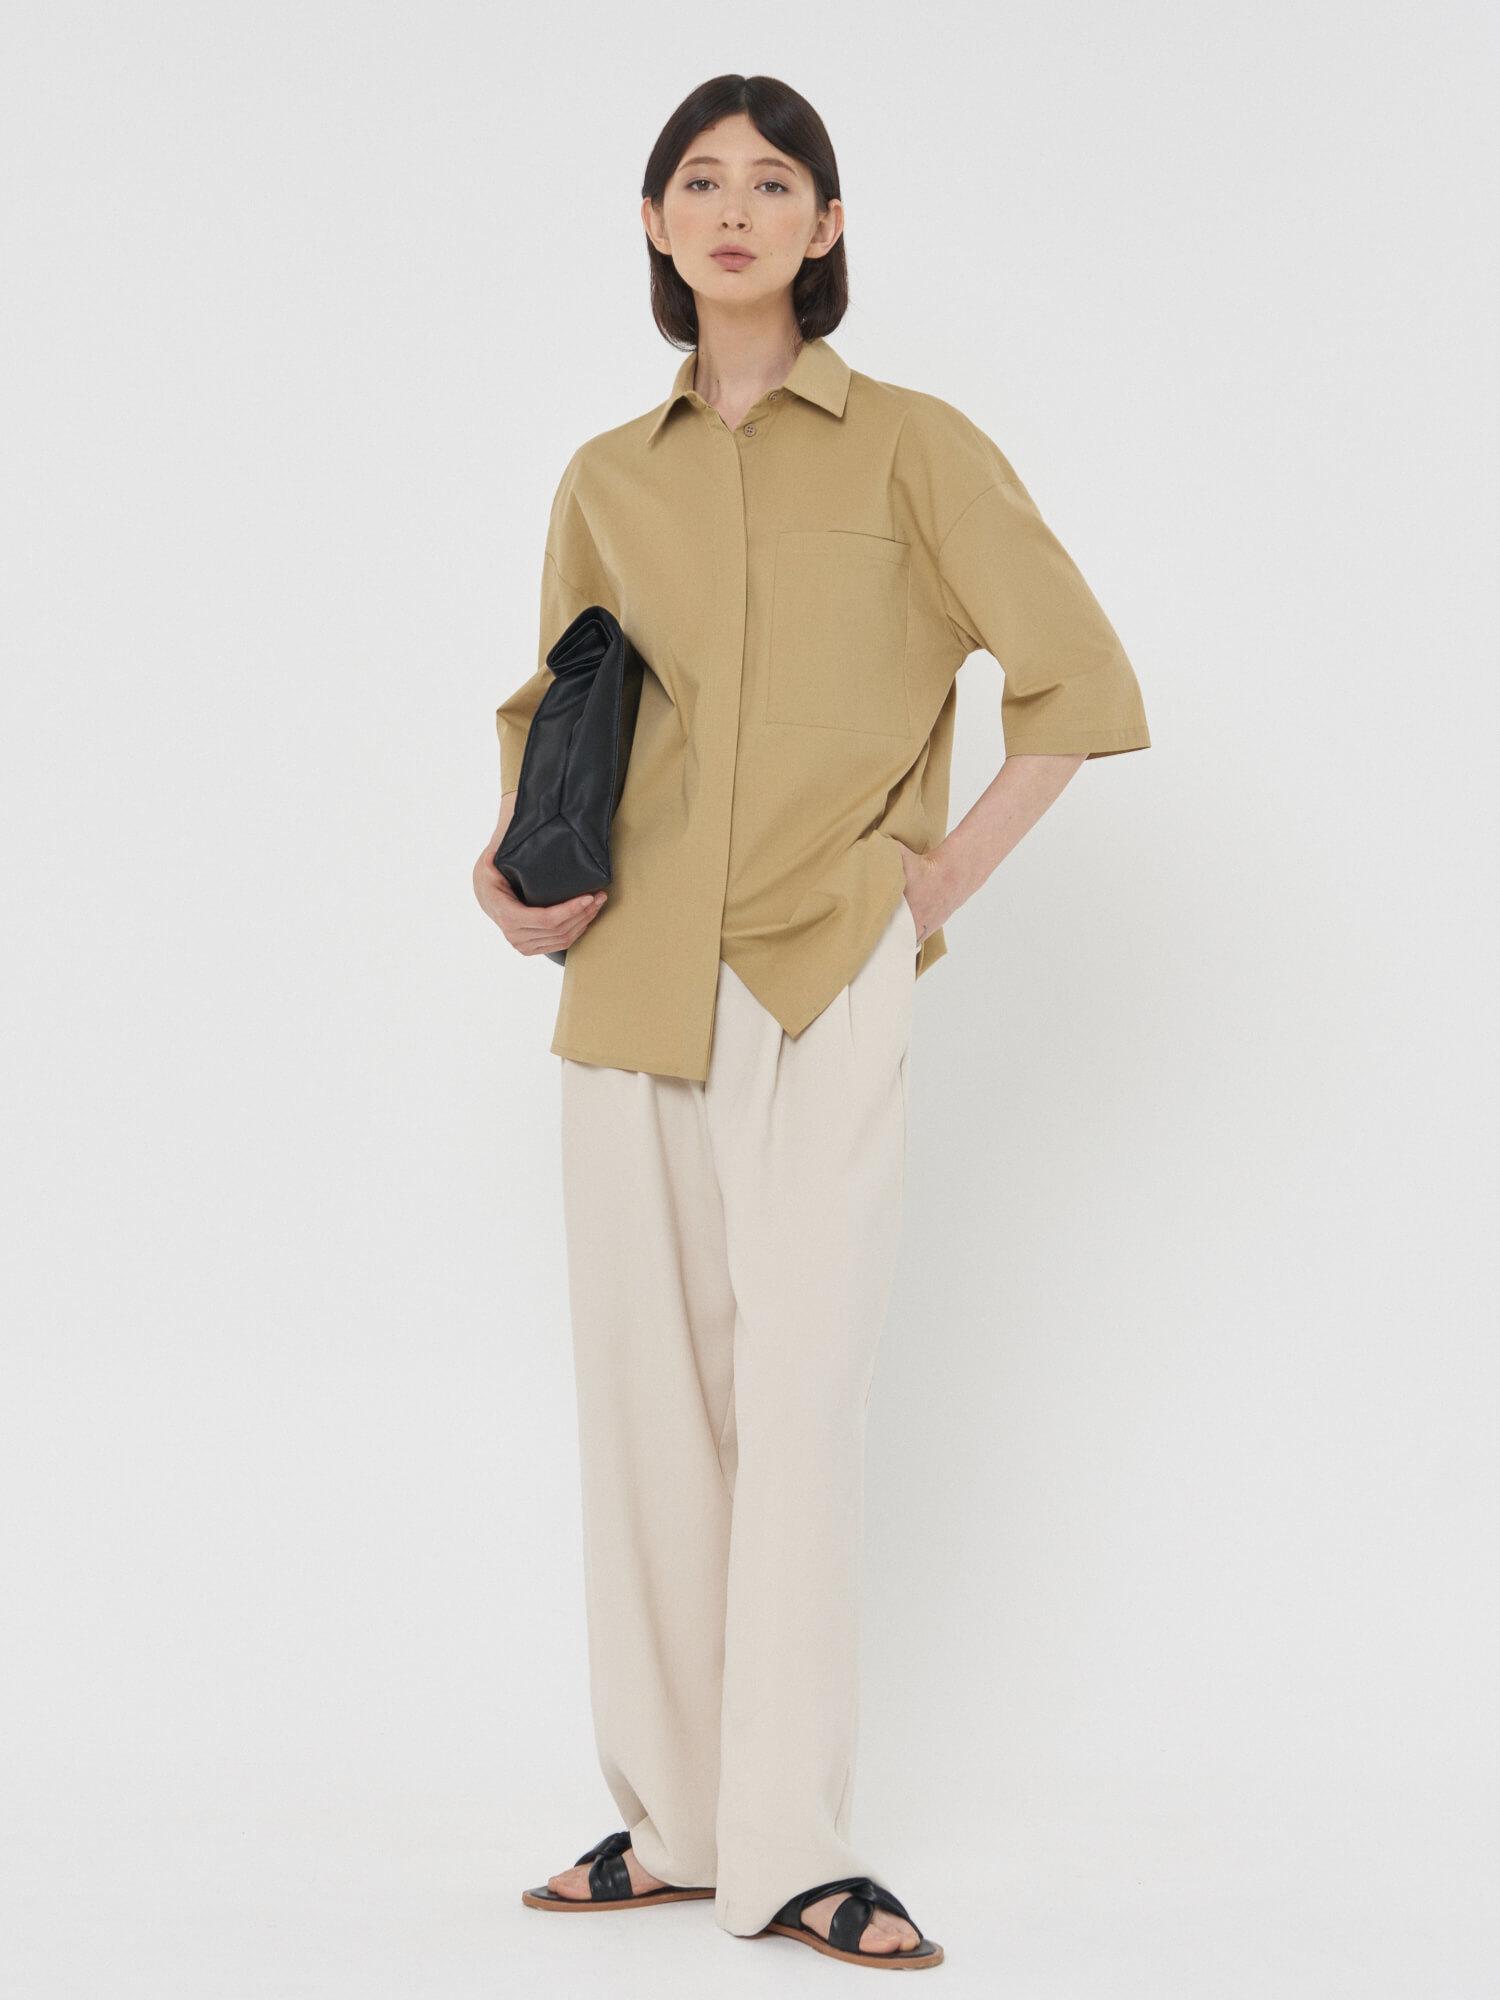 Рубашка Sienna с втачным карманом